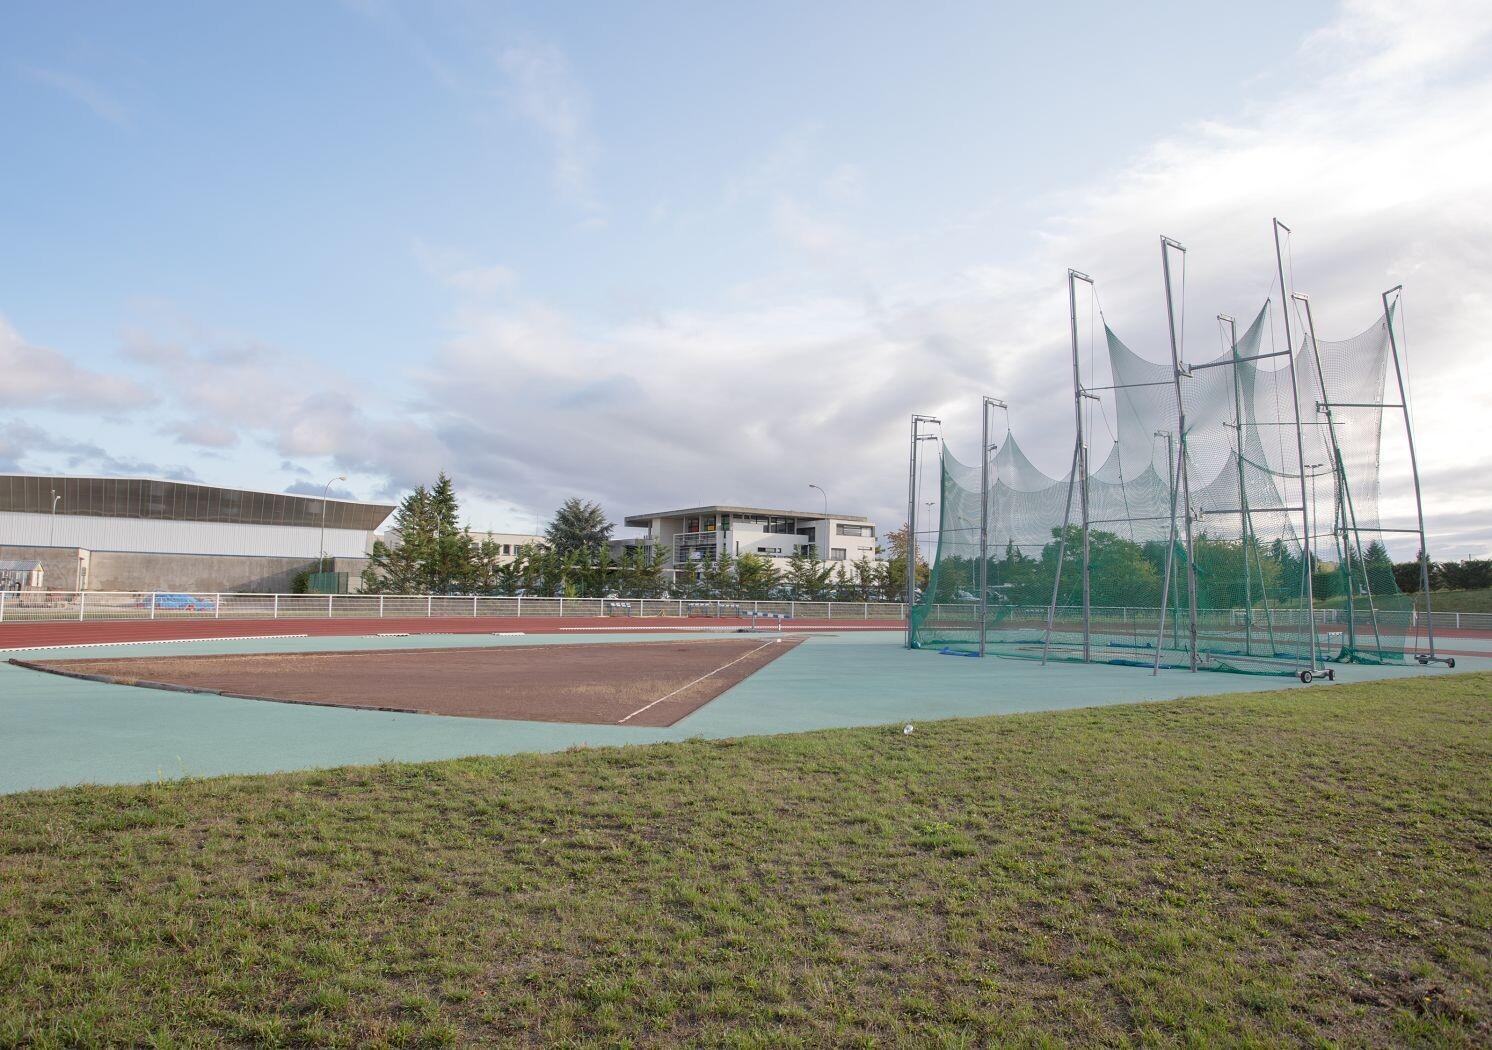 Le stade d 39 athl tisme colette besson les grandes for Piscine olympique dijon